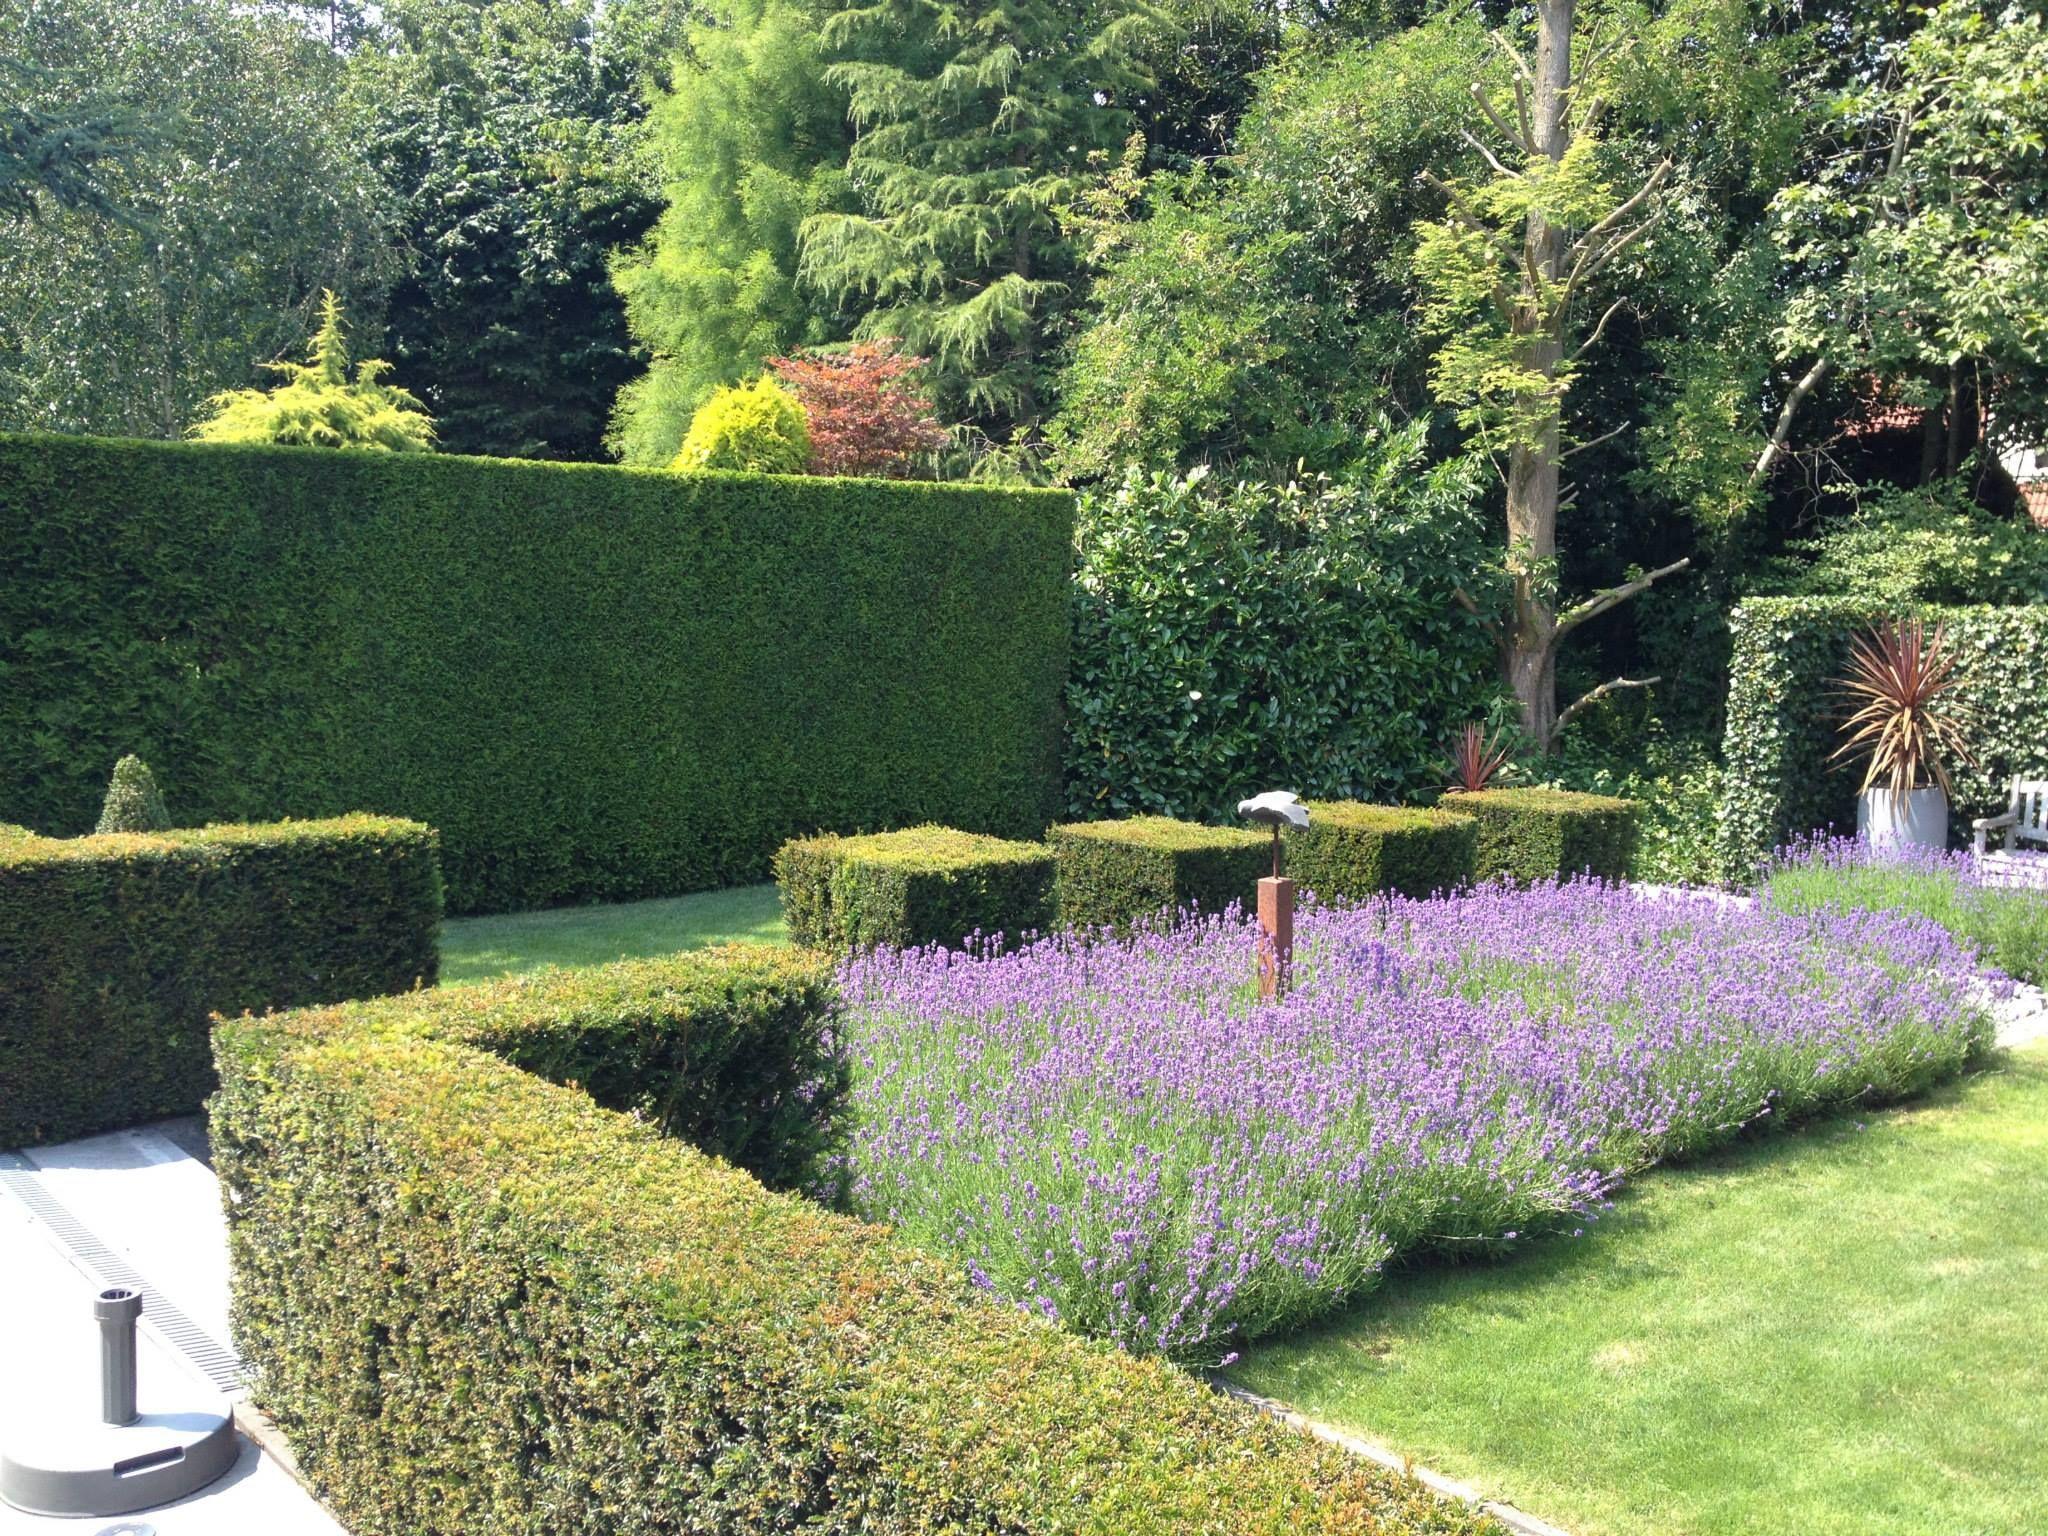 Tuin hovenier geometrie snoeien vormsnoeien paars for Tuin snoeien